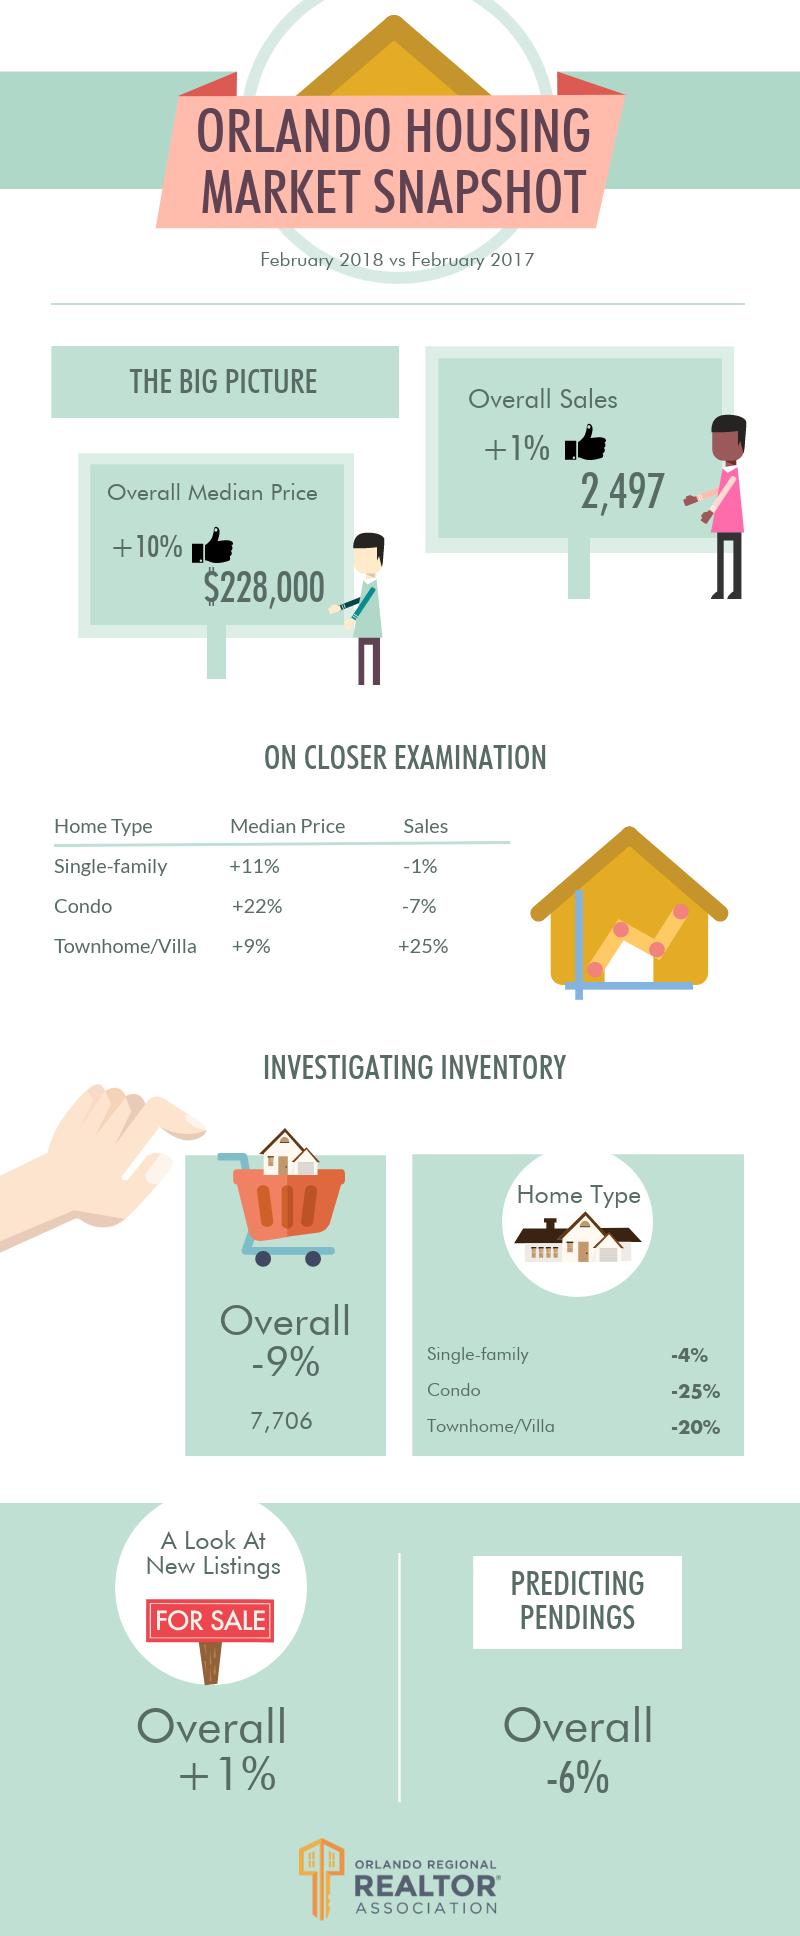 Orlando Housing Market Snapshot Comparison: January 2016-January 2017